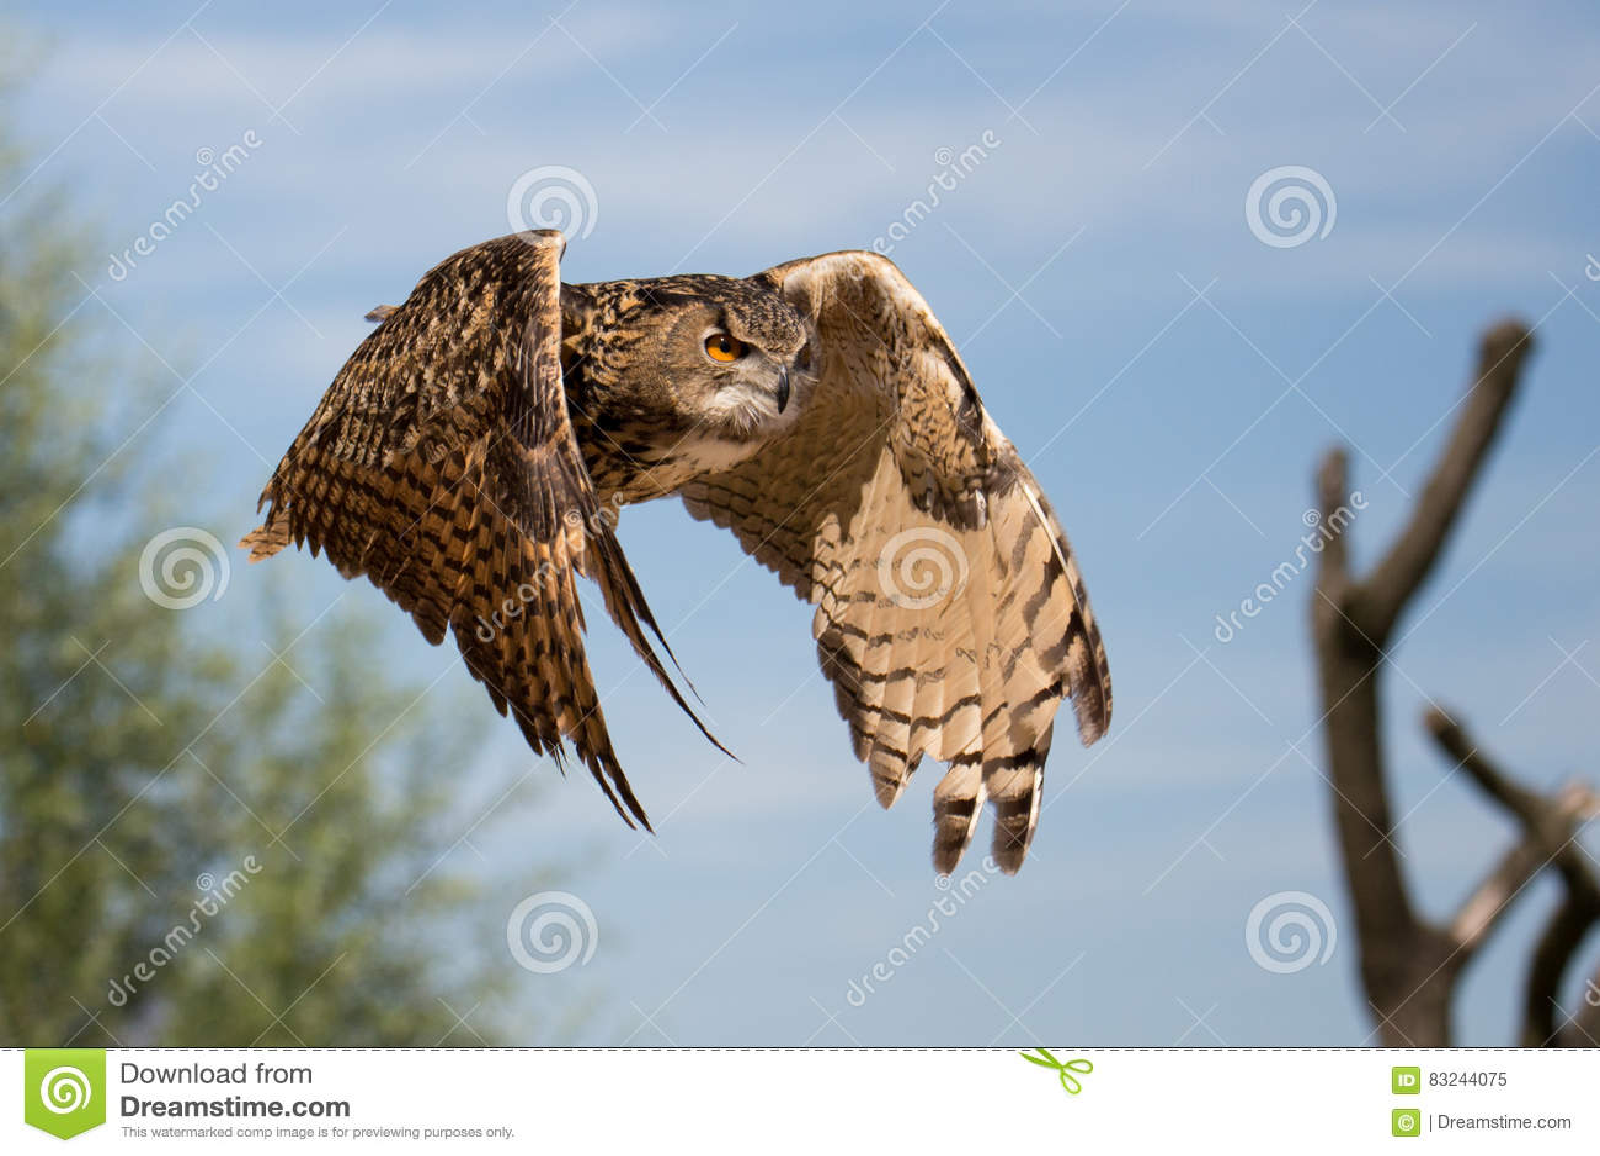 A flying owl in zoo